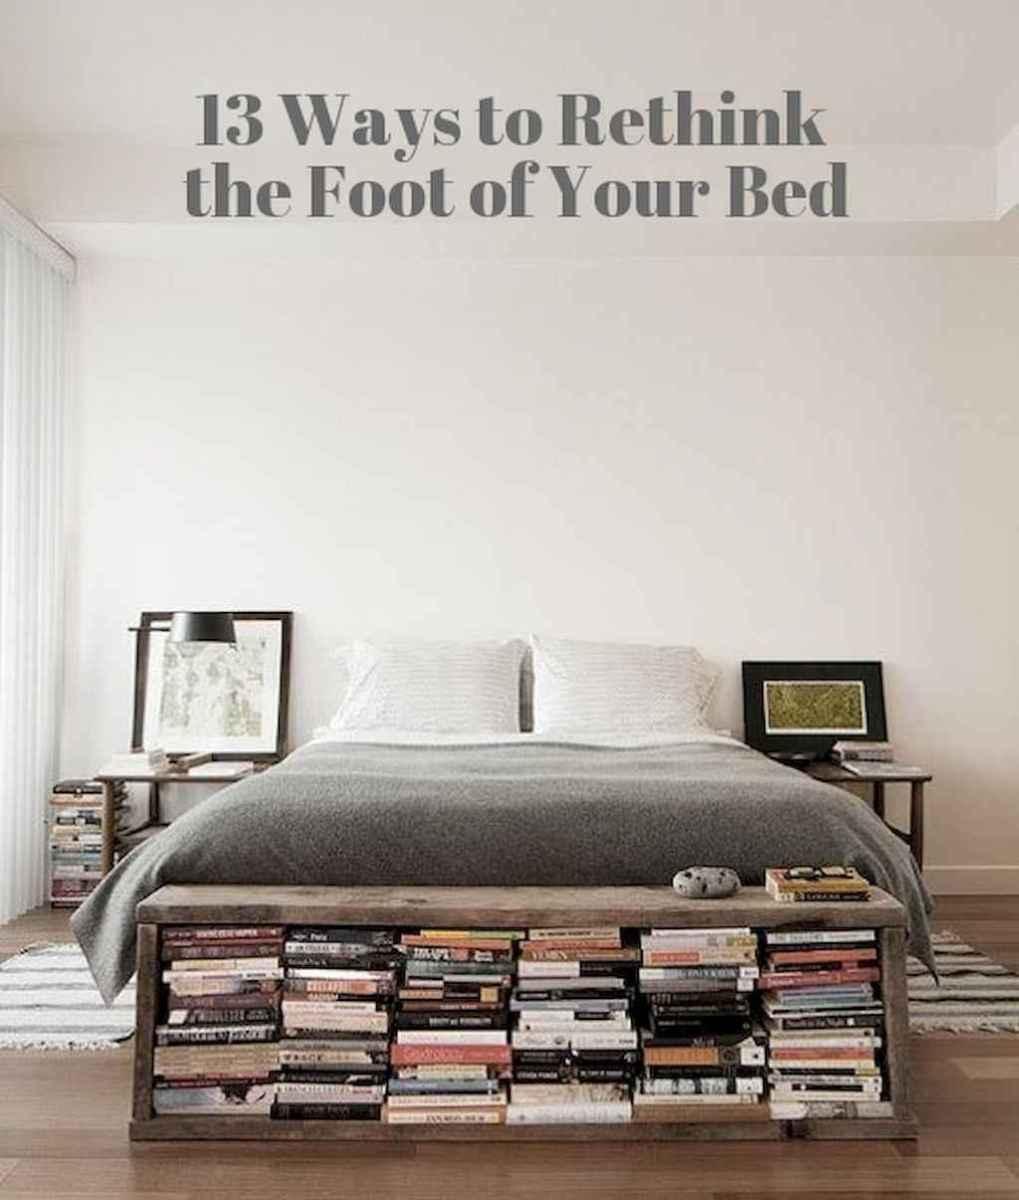 30 amazing college apartment bedroom decor ideas (29) - Roomadness.com